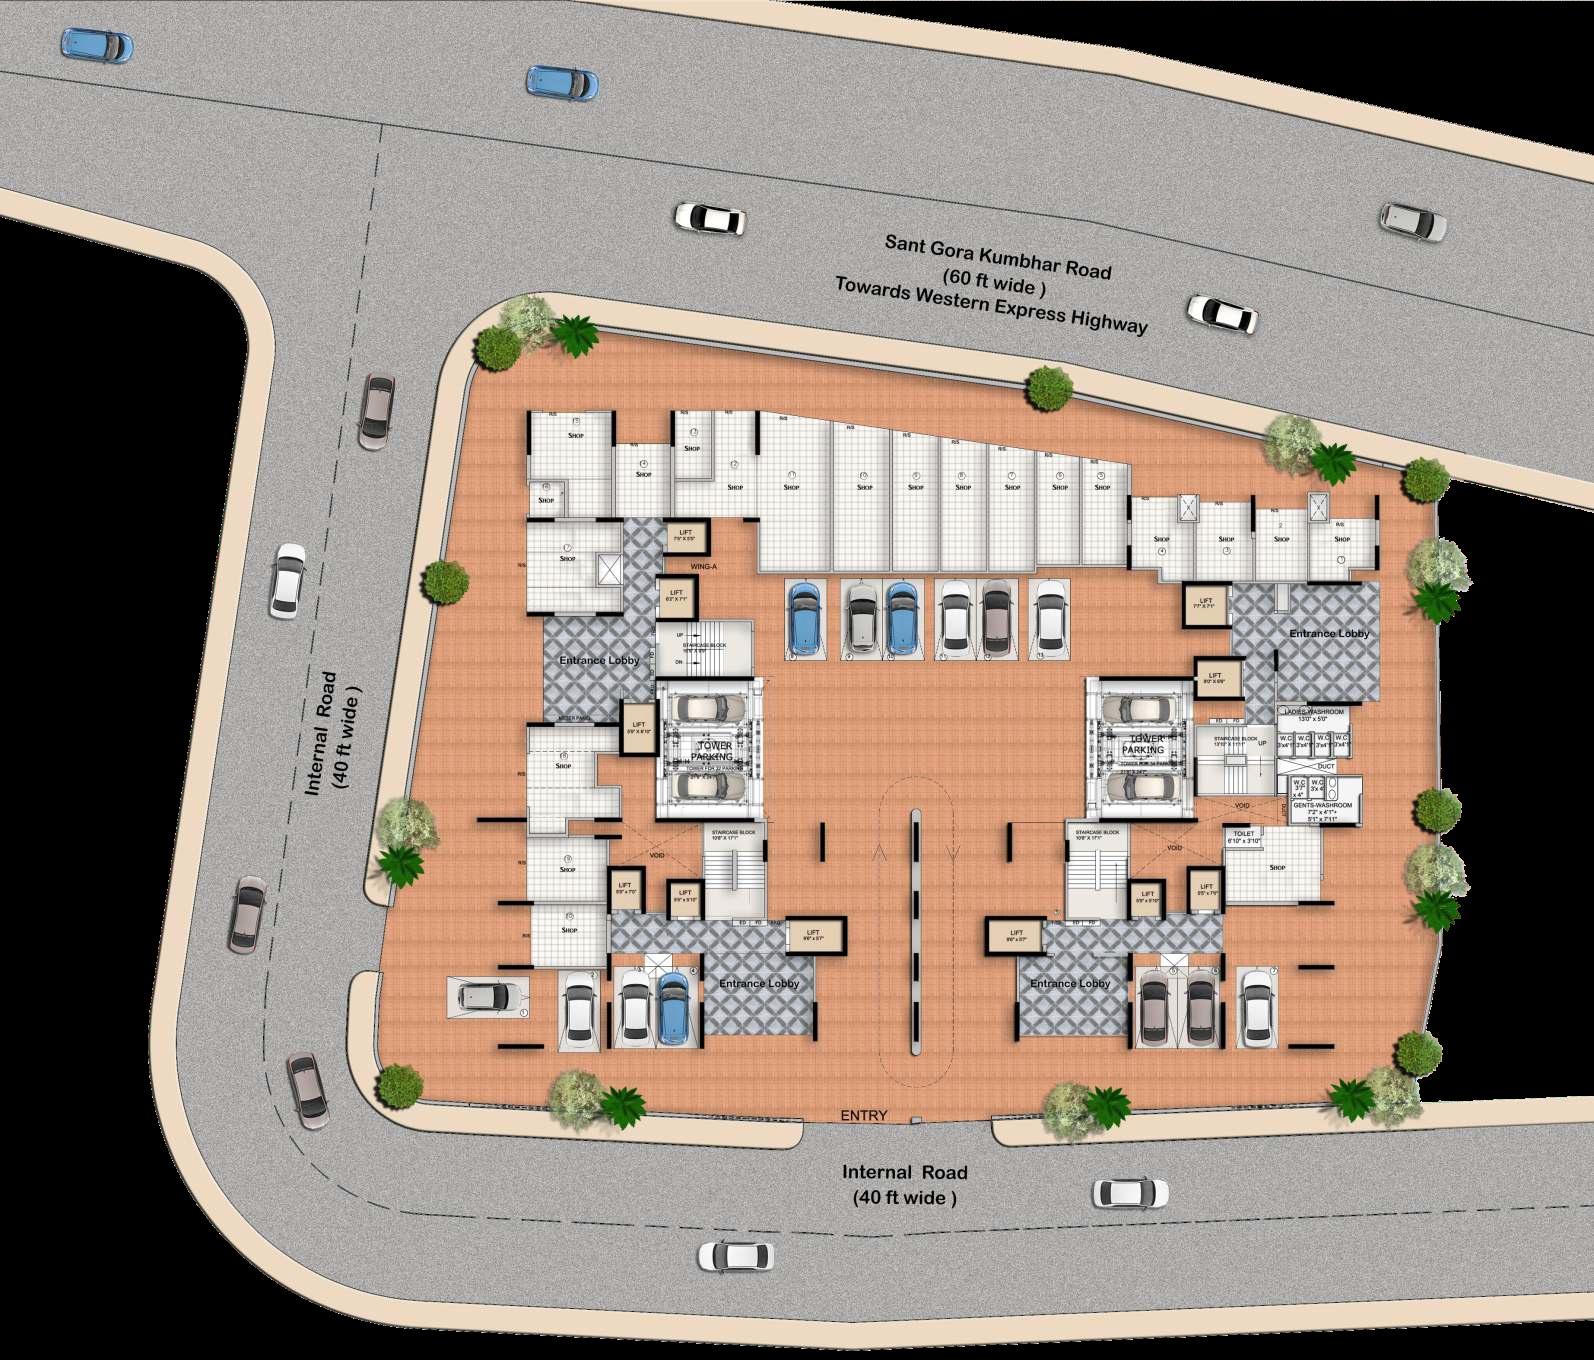 paradigm ariana residency project master plan image1